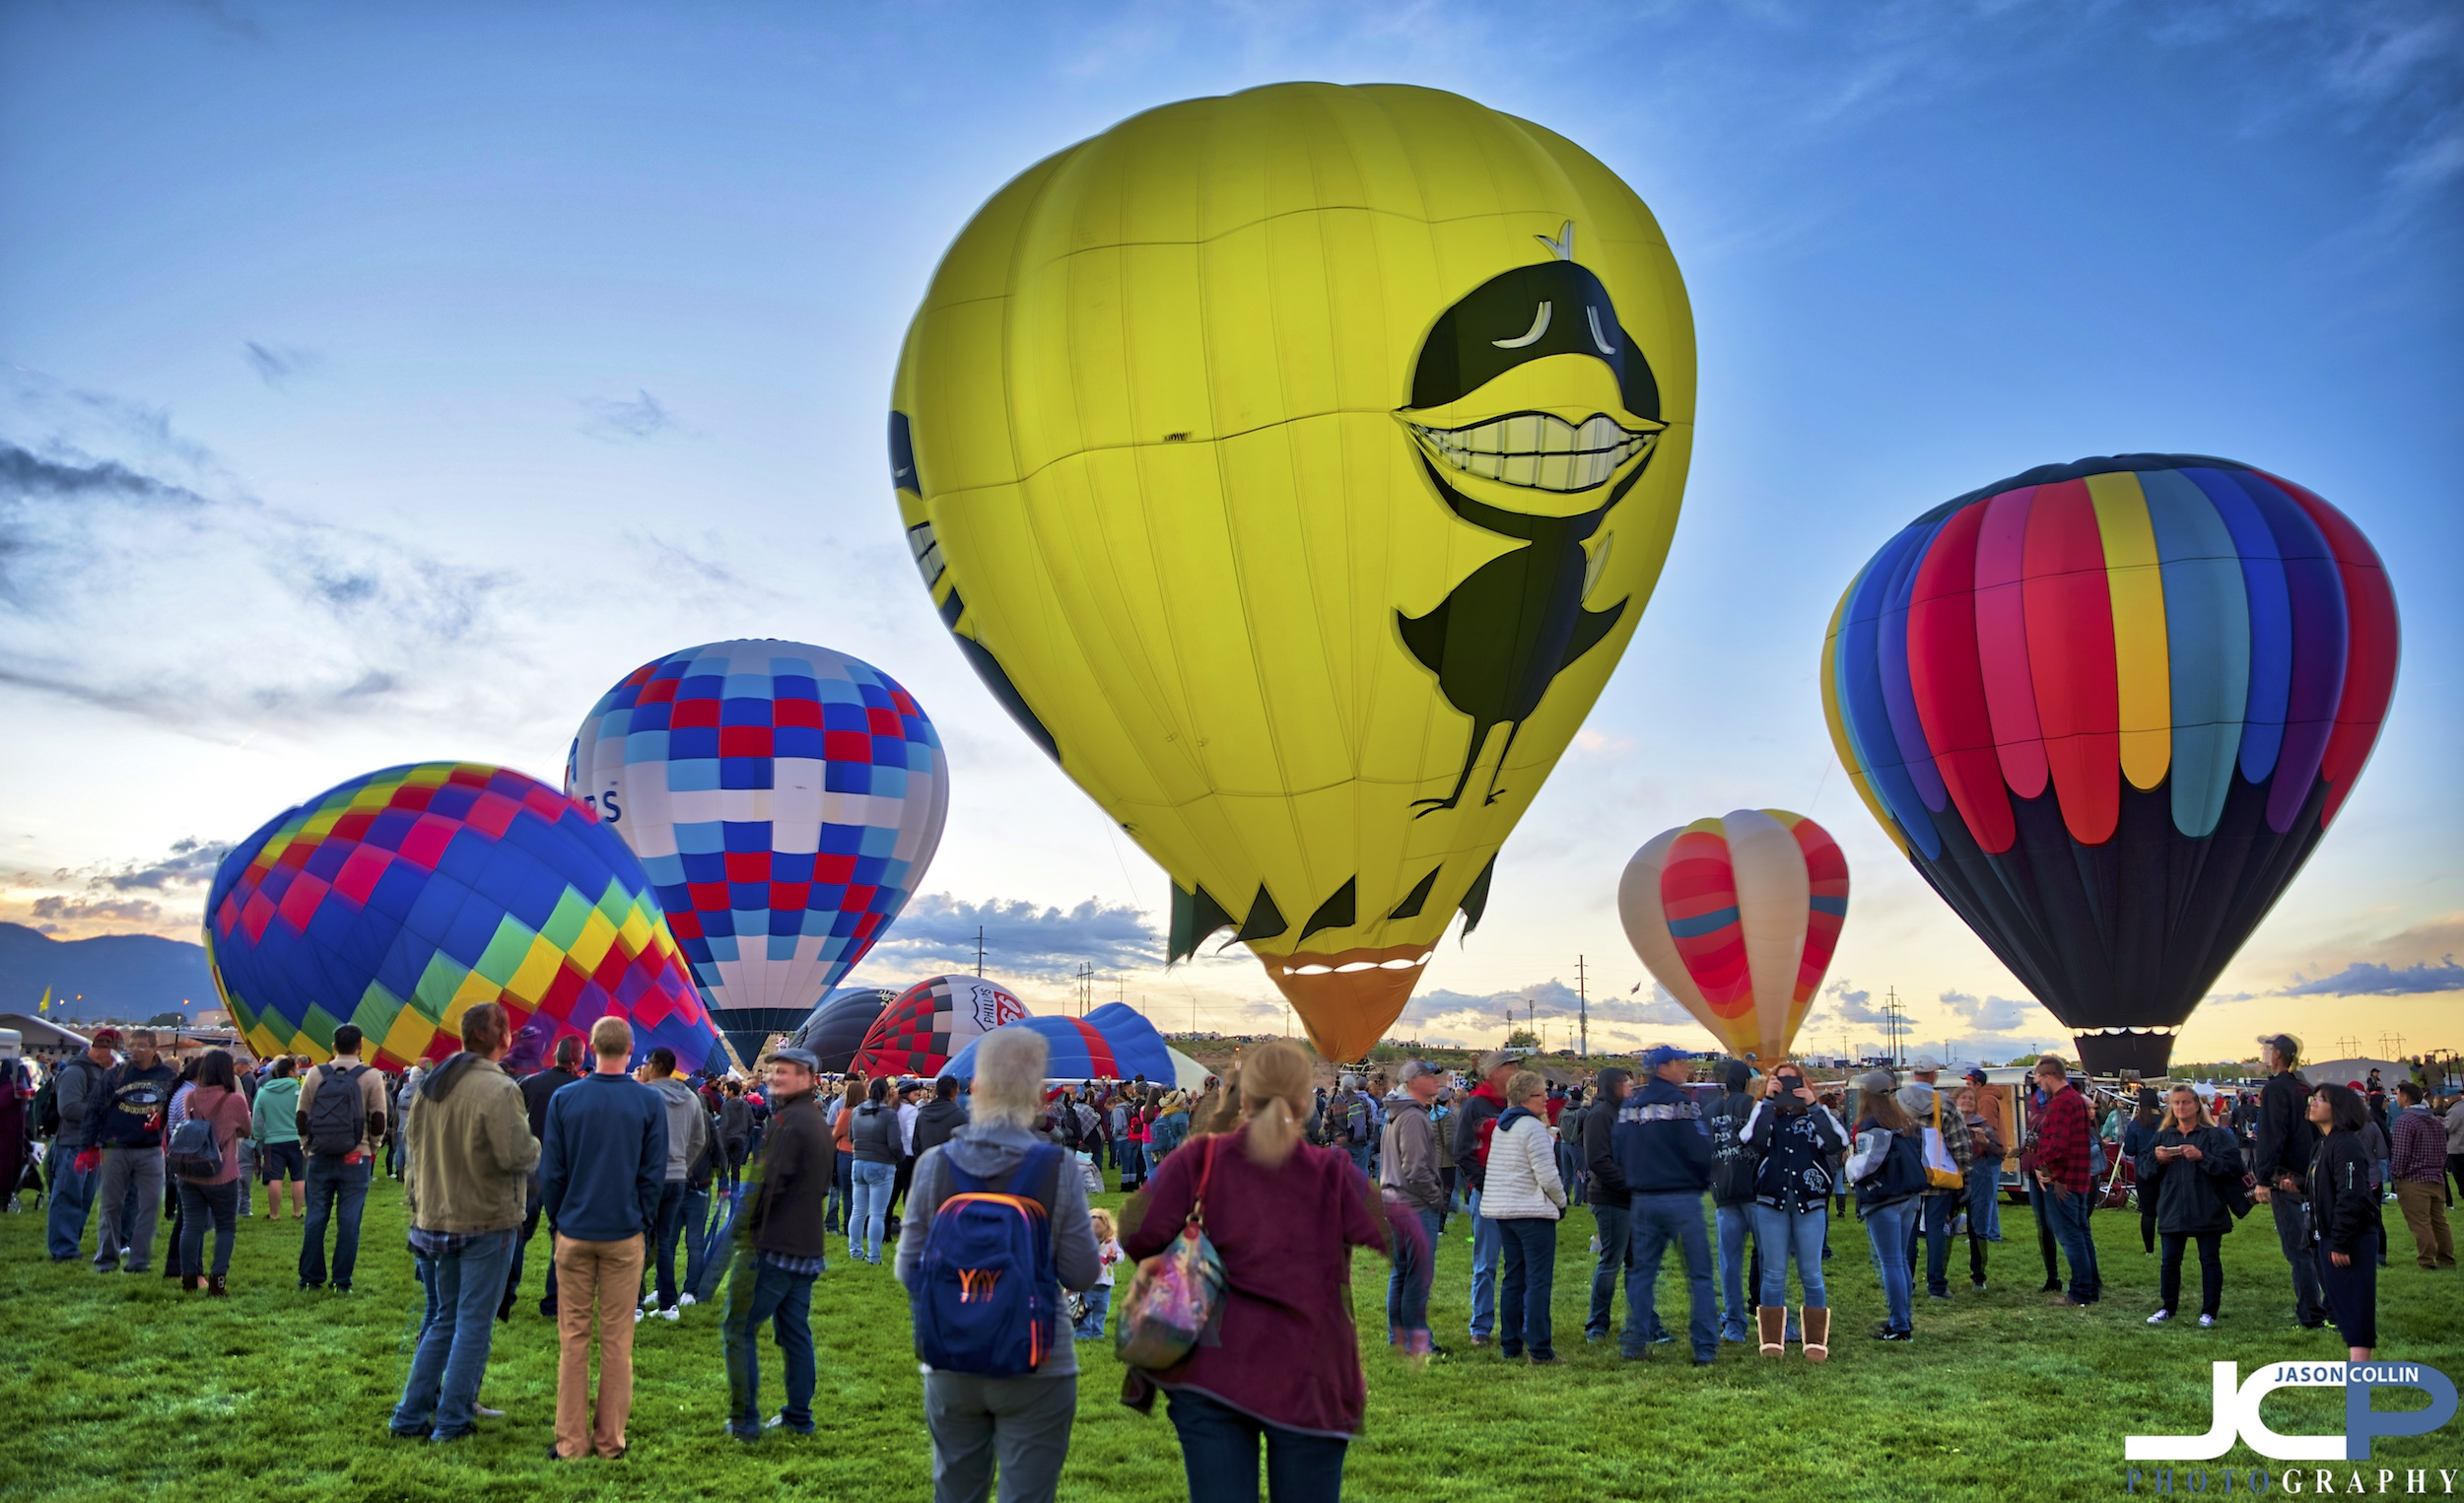 balloon-fiesta-2018-abq-108253.jpg